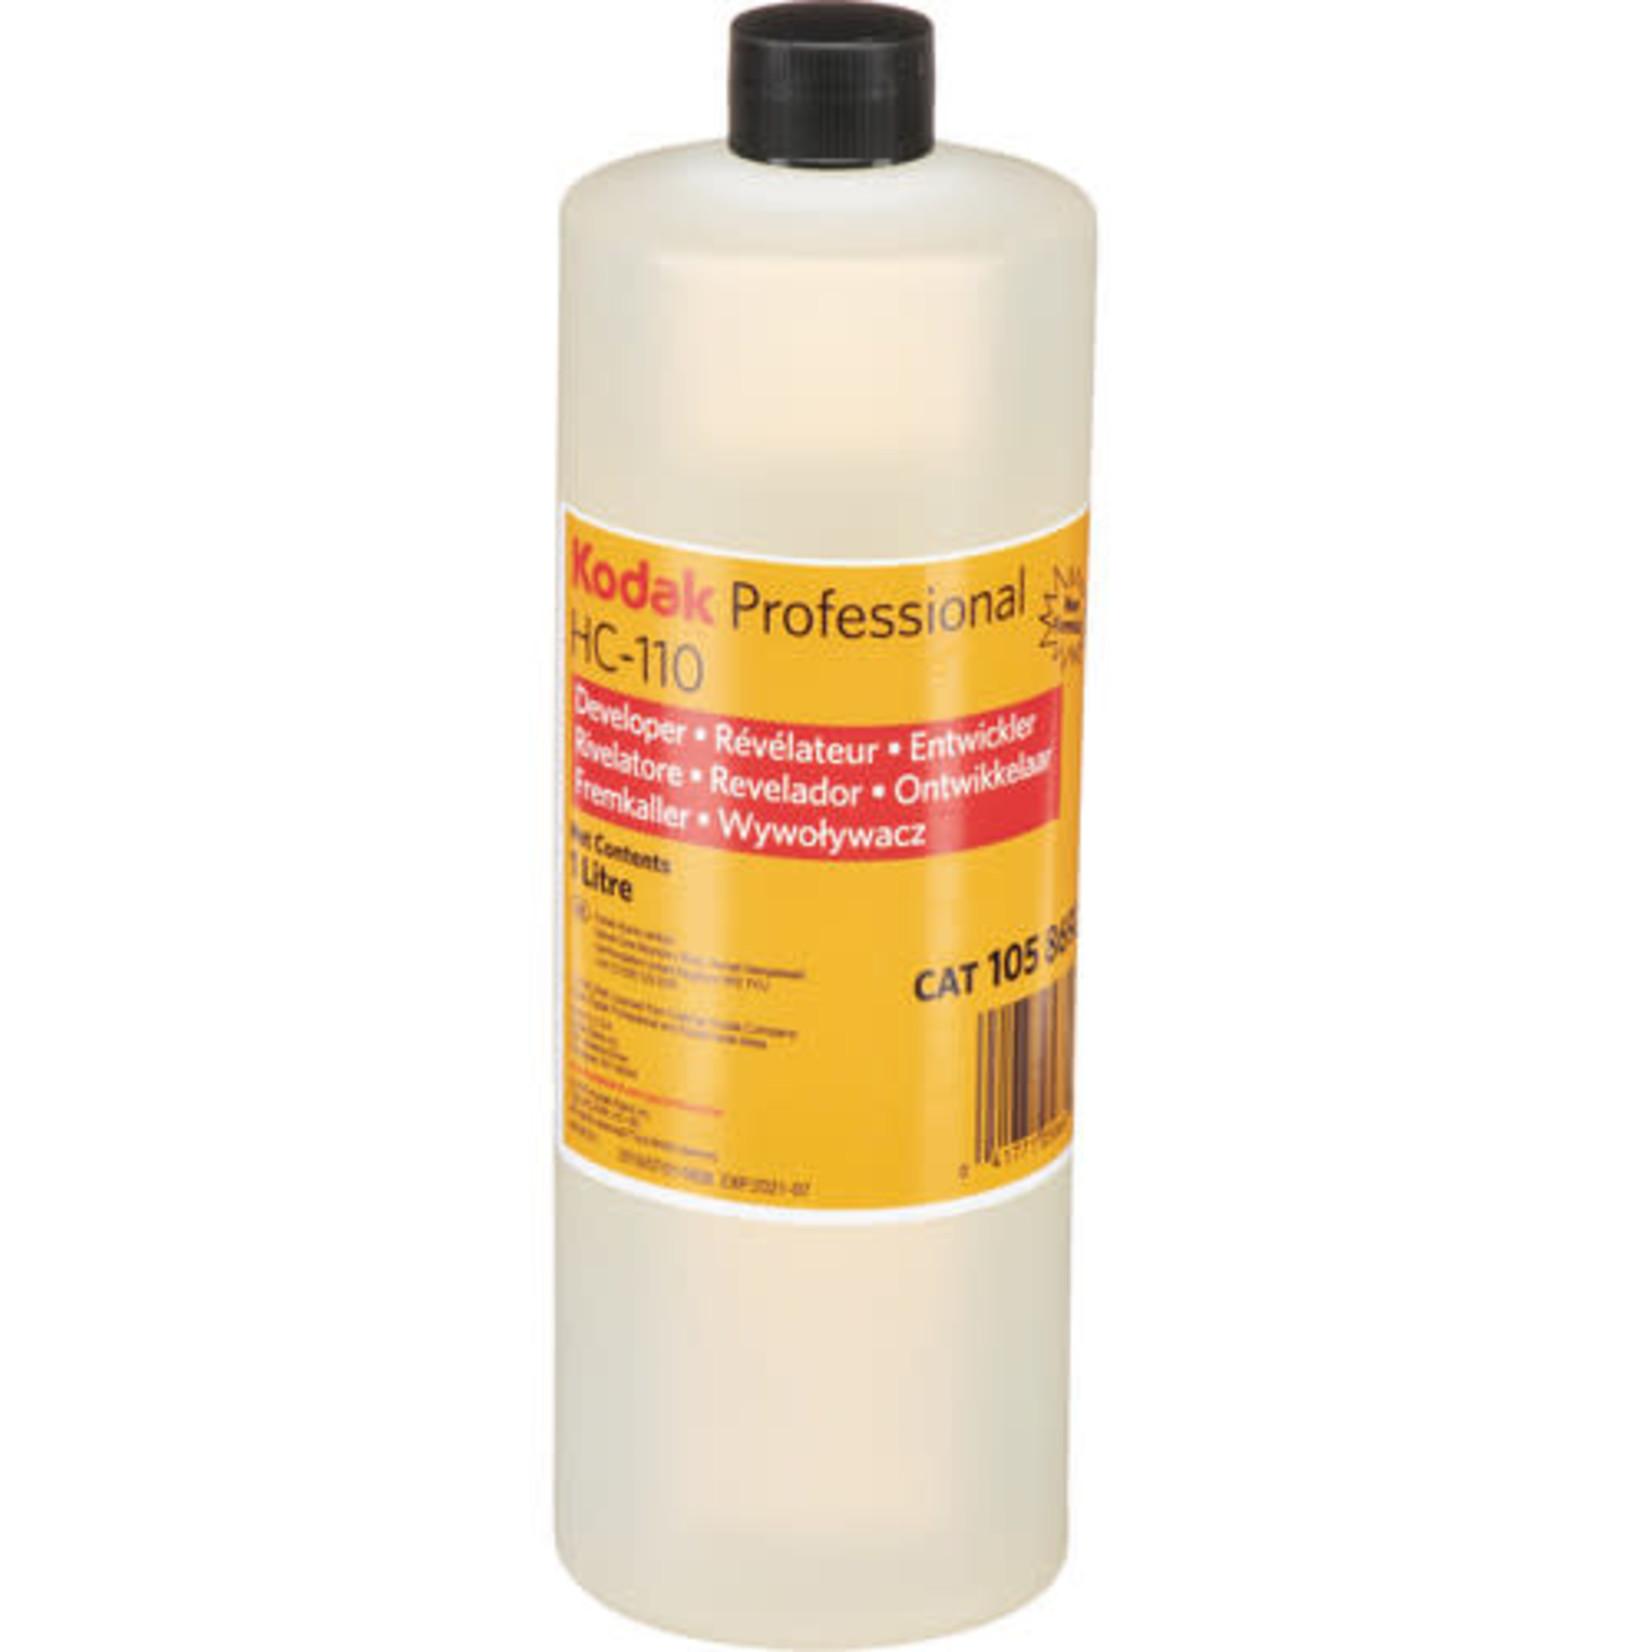 Kodak Kodak Professional HC-110 Film Developer (1L, 2019 Version)